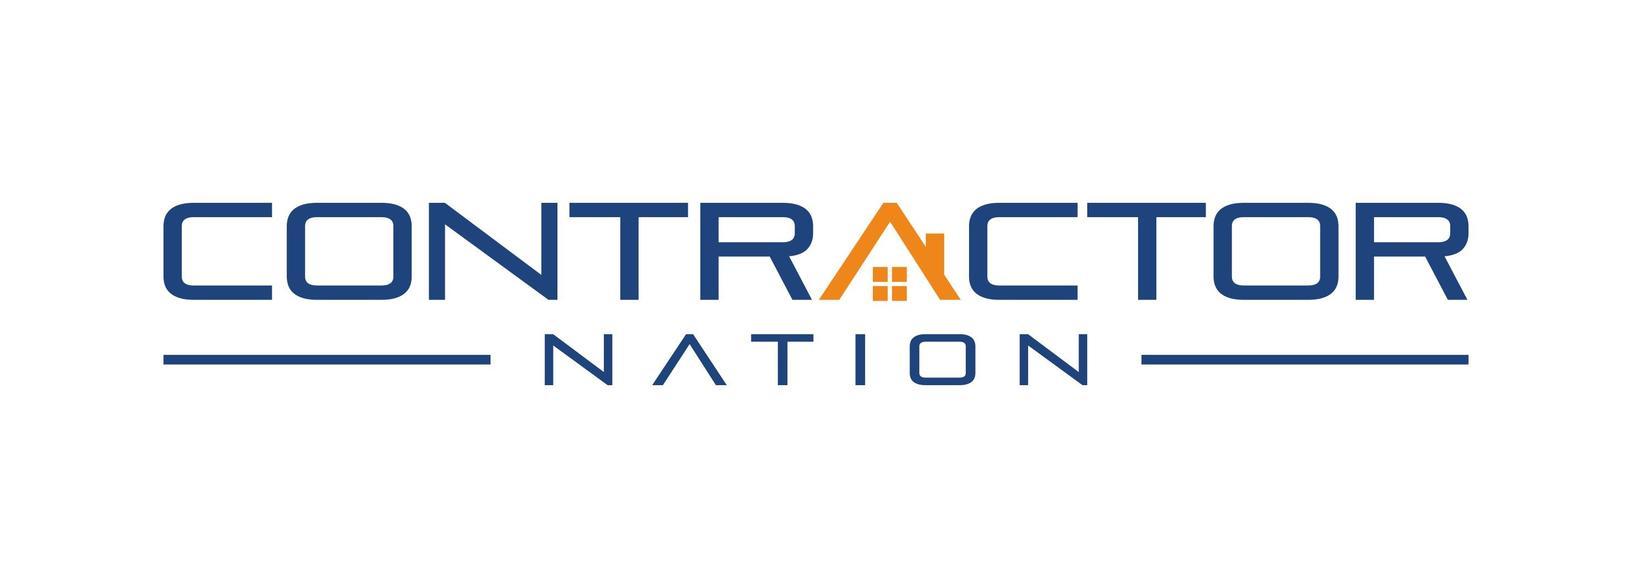 Contractor nation logo